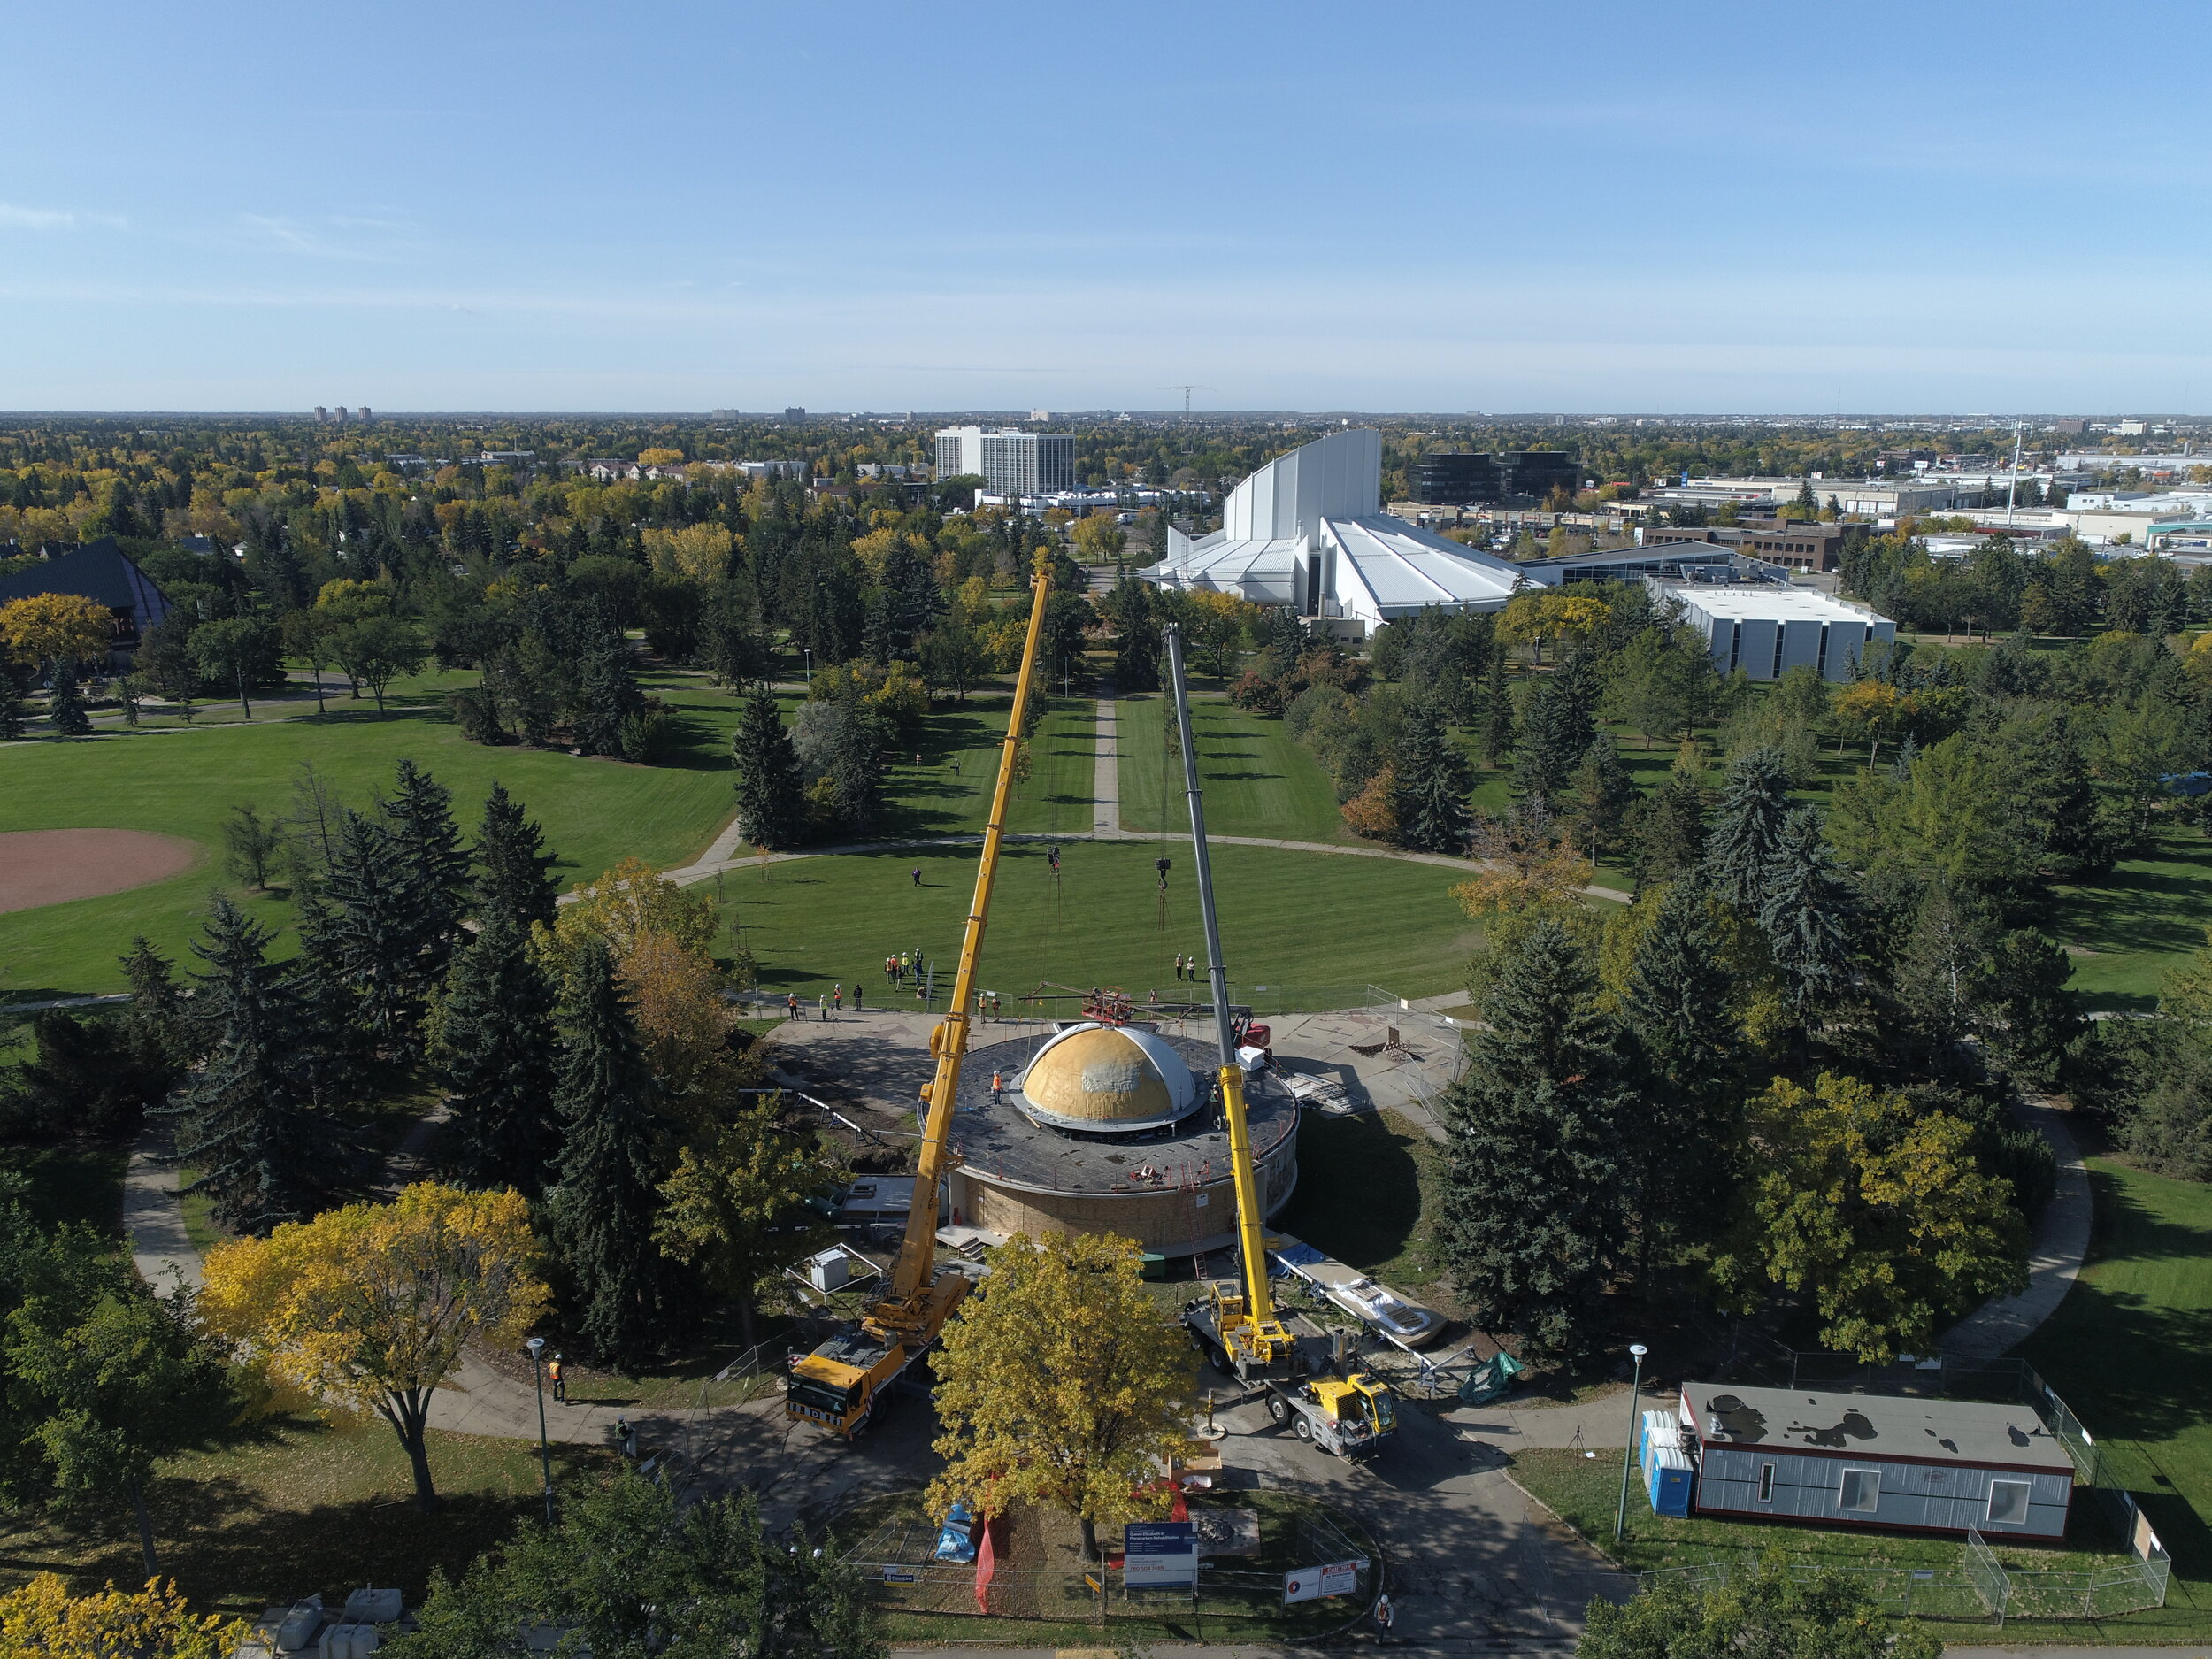 Queen Elizabeth II Planetarium Dome Installation